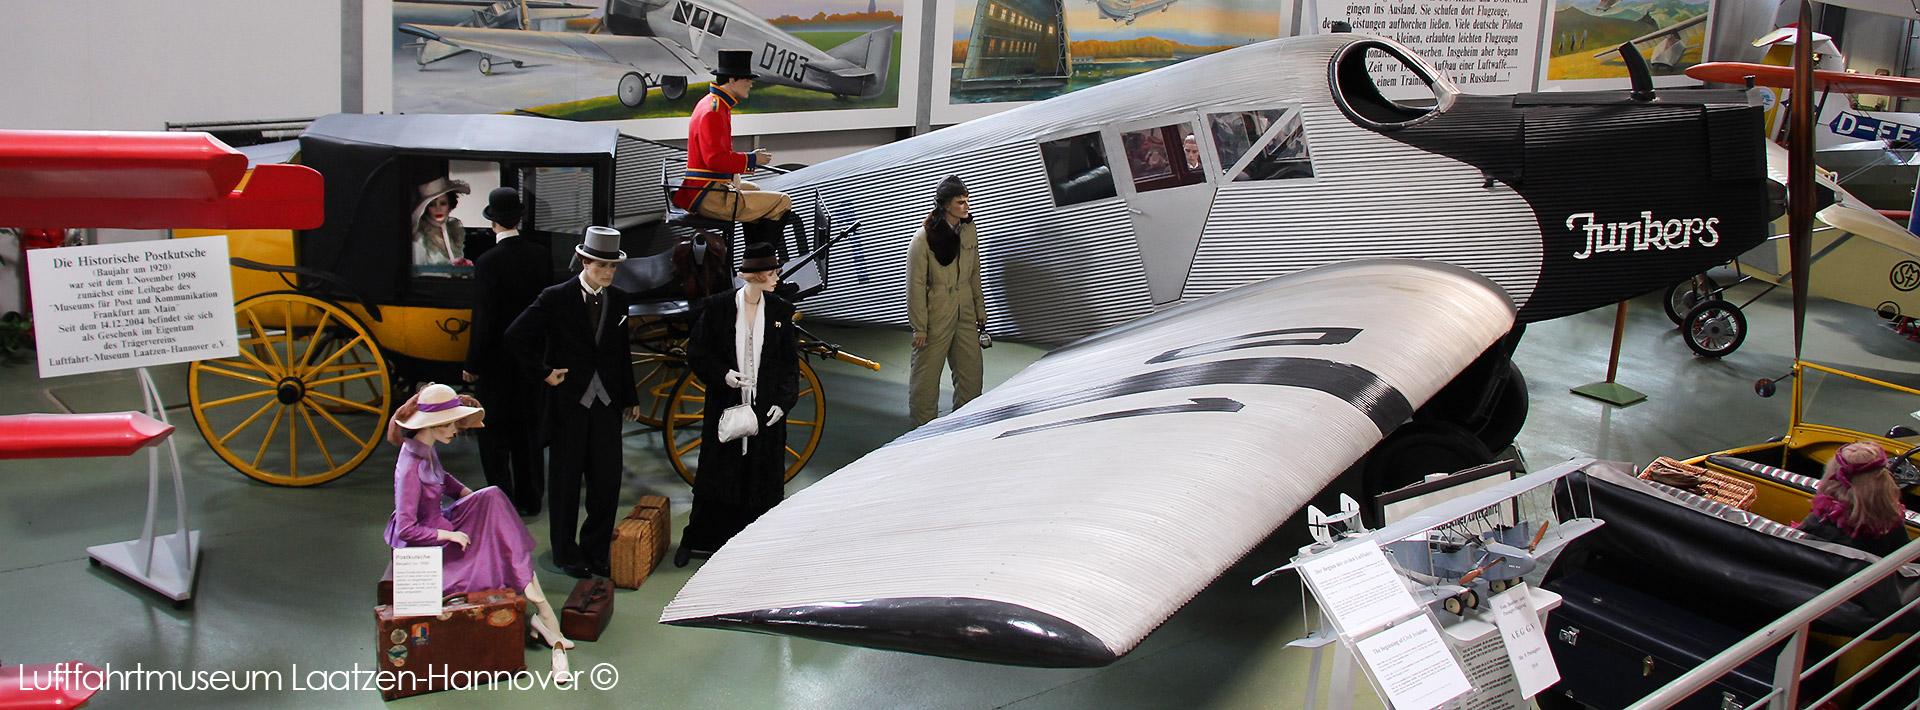 luftfahrtmuseum_laatzen_hannover1